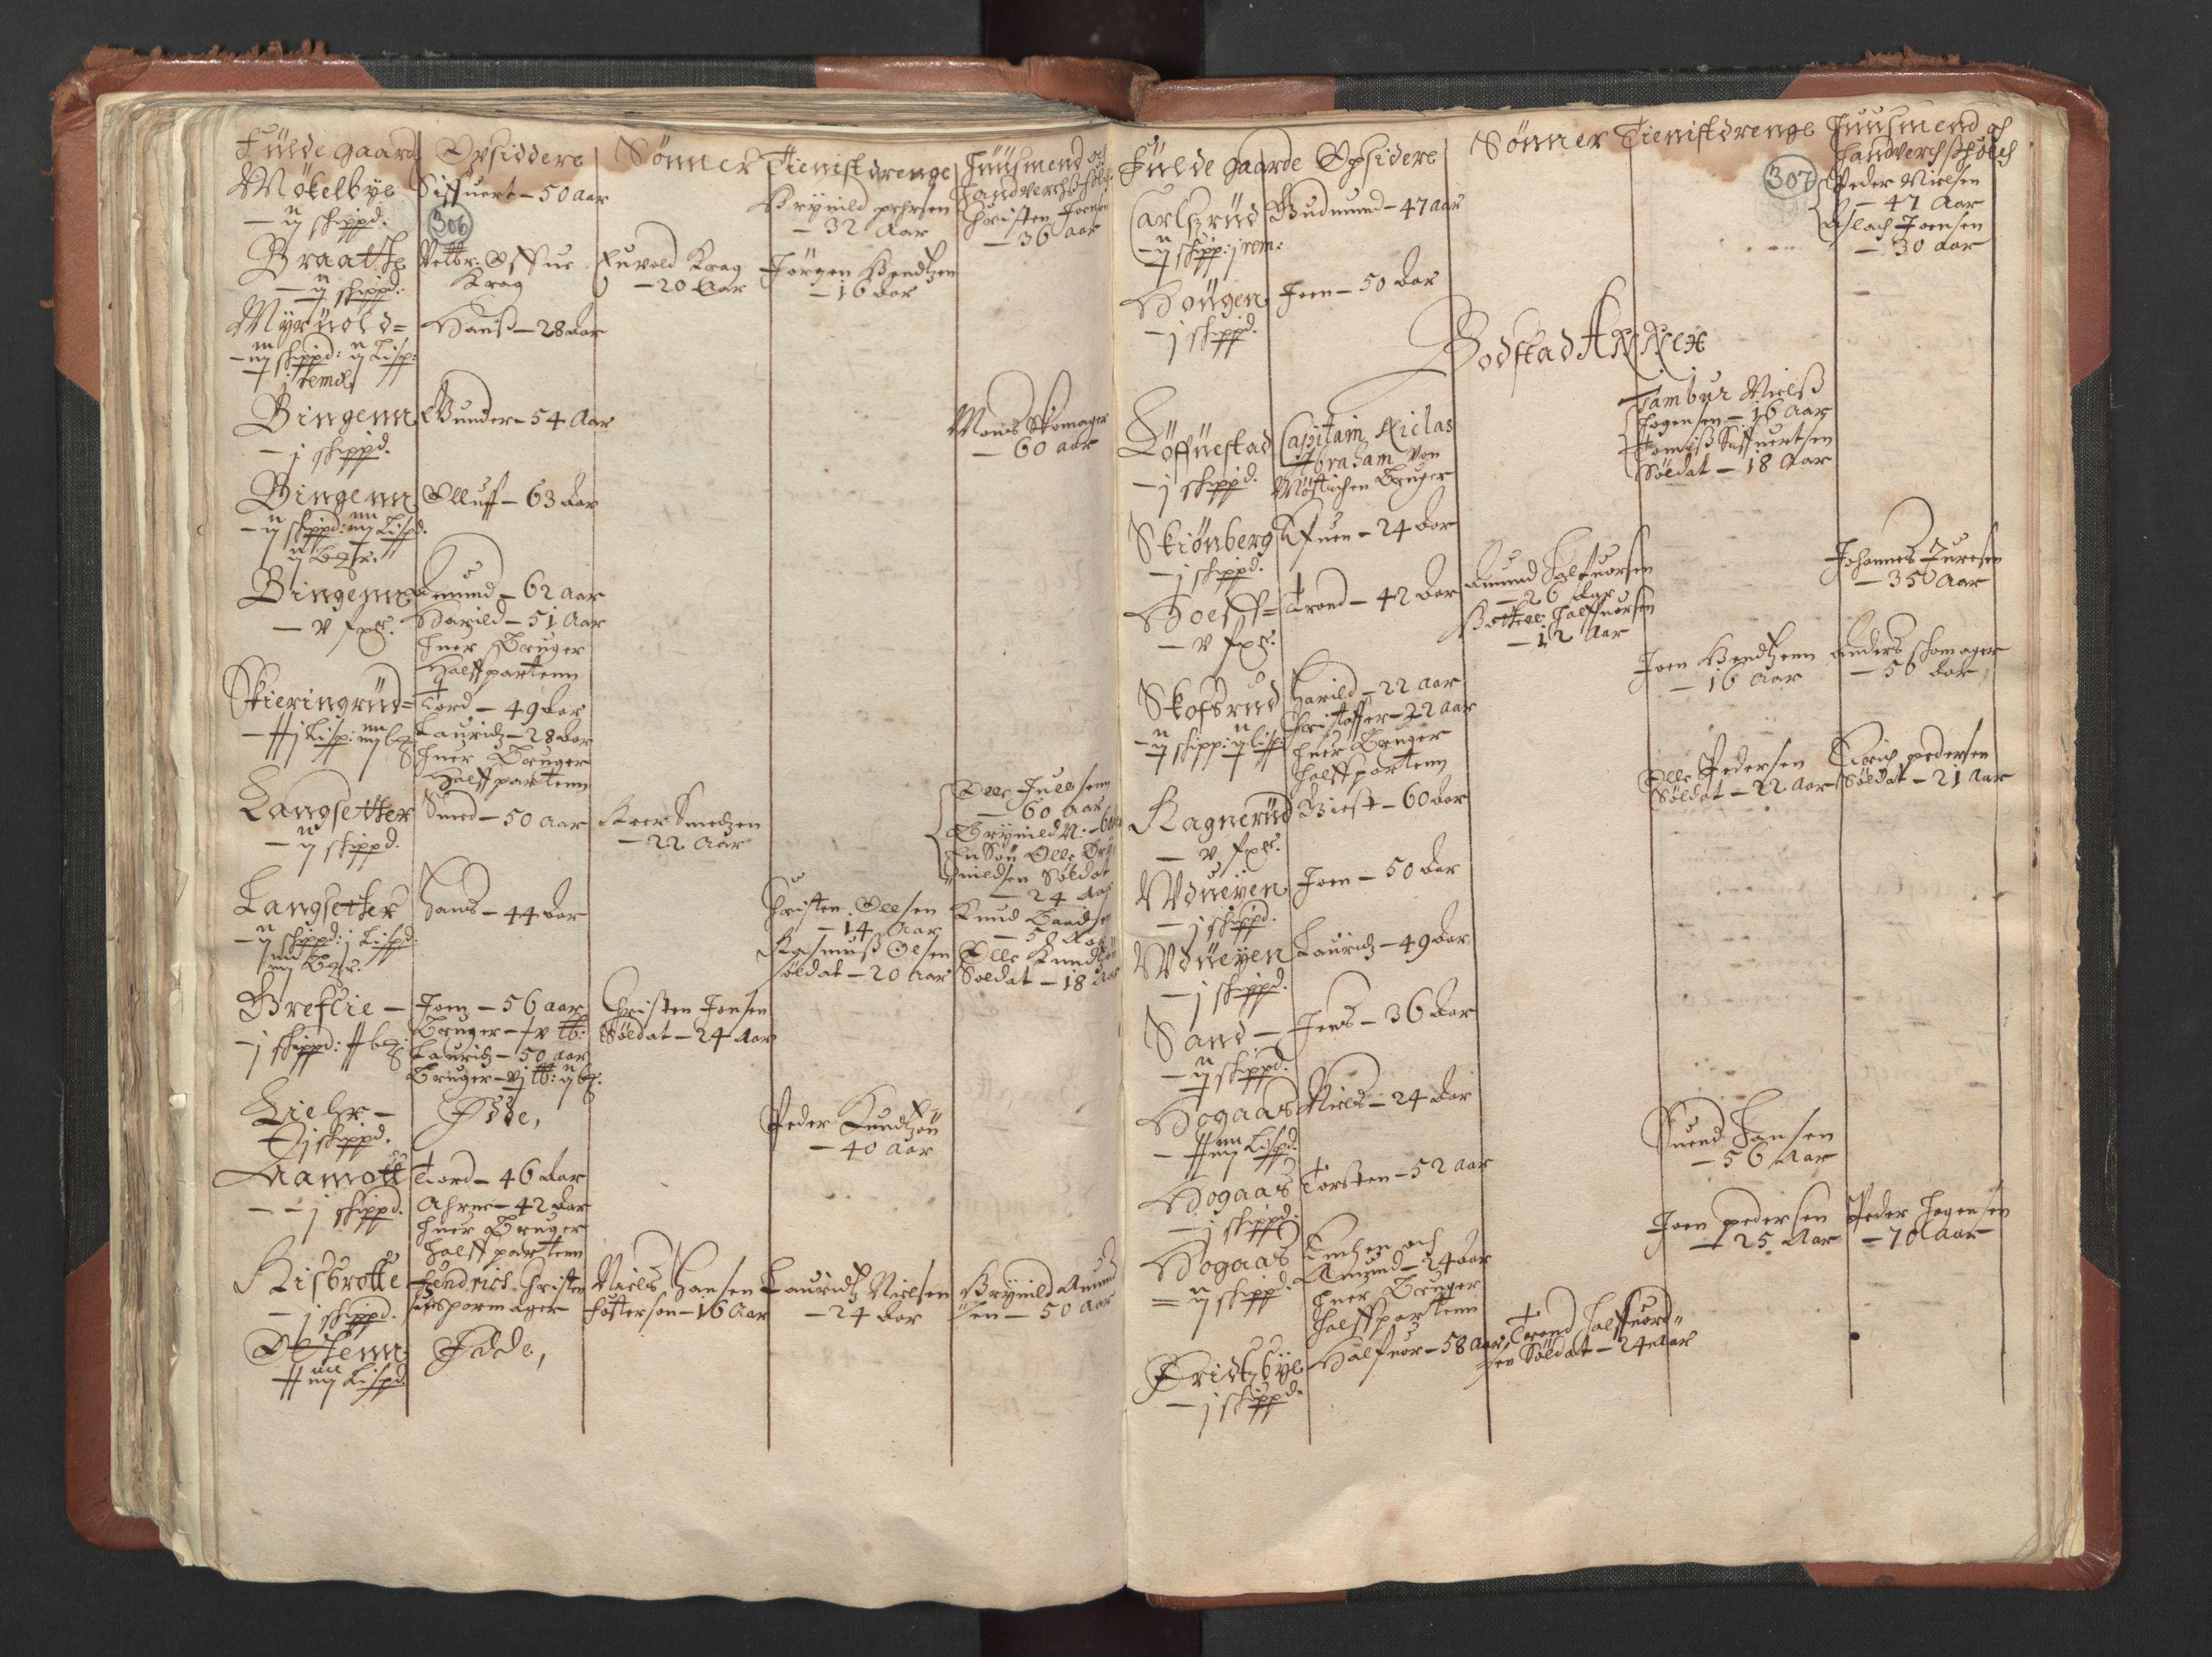 RA, Fogdenes og sorenskrivernes manntall 1664-1666, nr. 1: Fogderier (len og skipreider) i nåværende Østfold fylke, 1664, s. 306-307